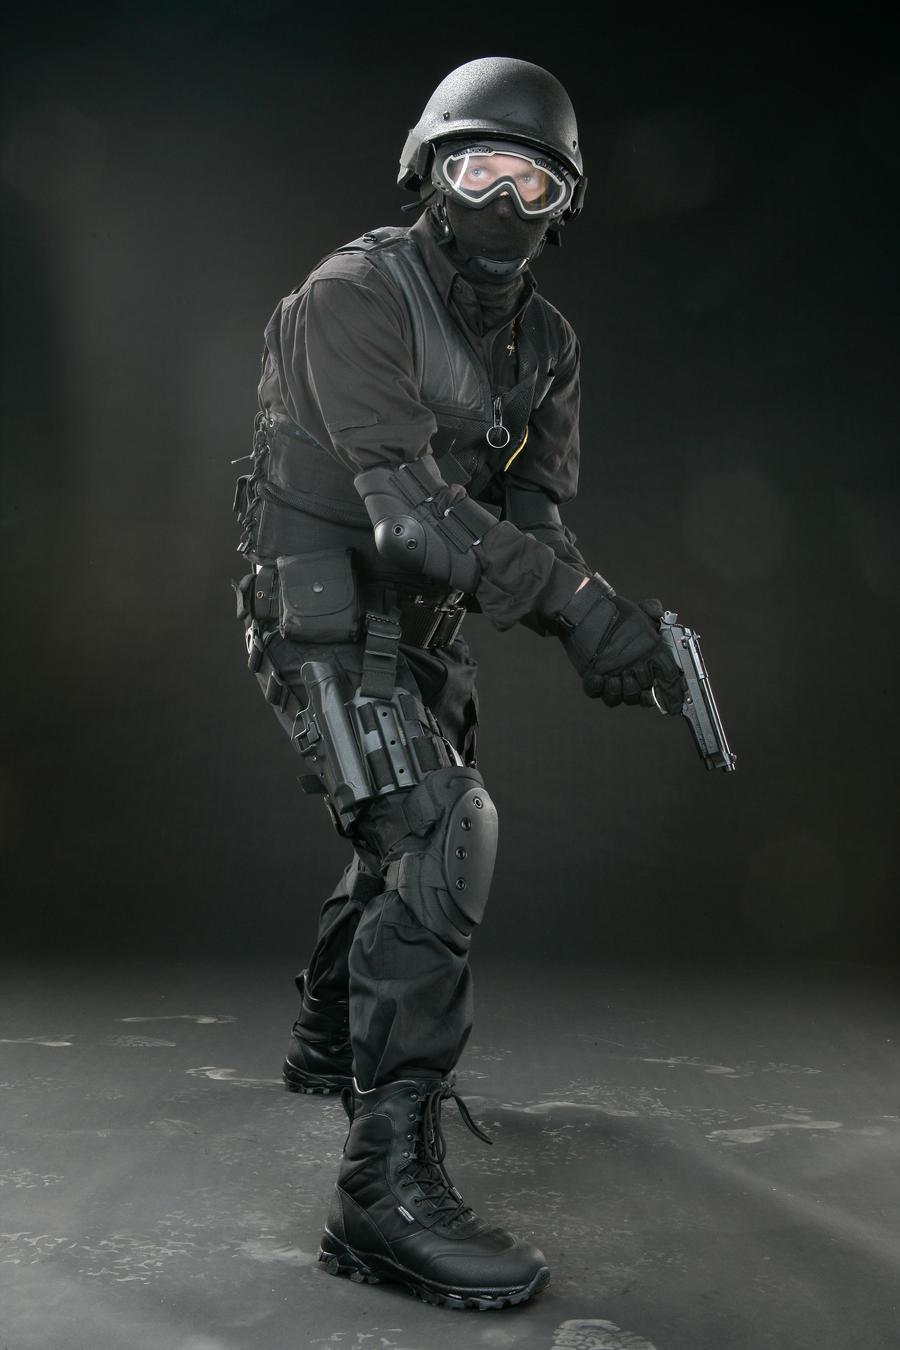 SWAT pistol 3 by Blaq-Unicorn